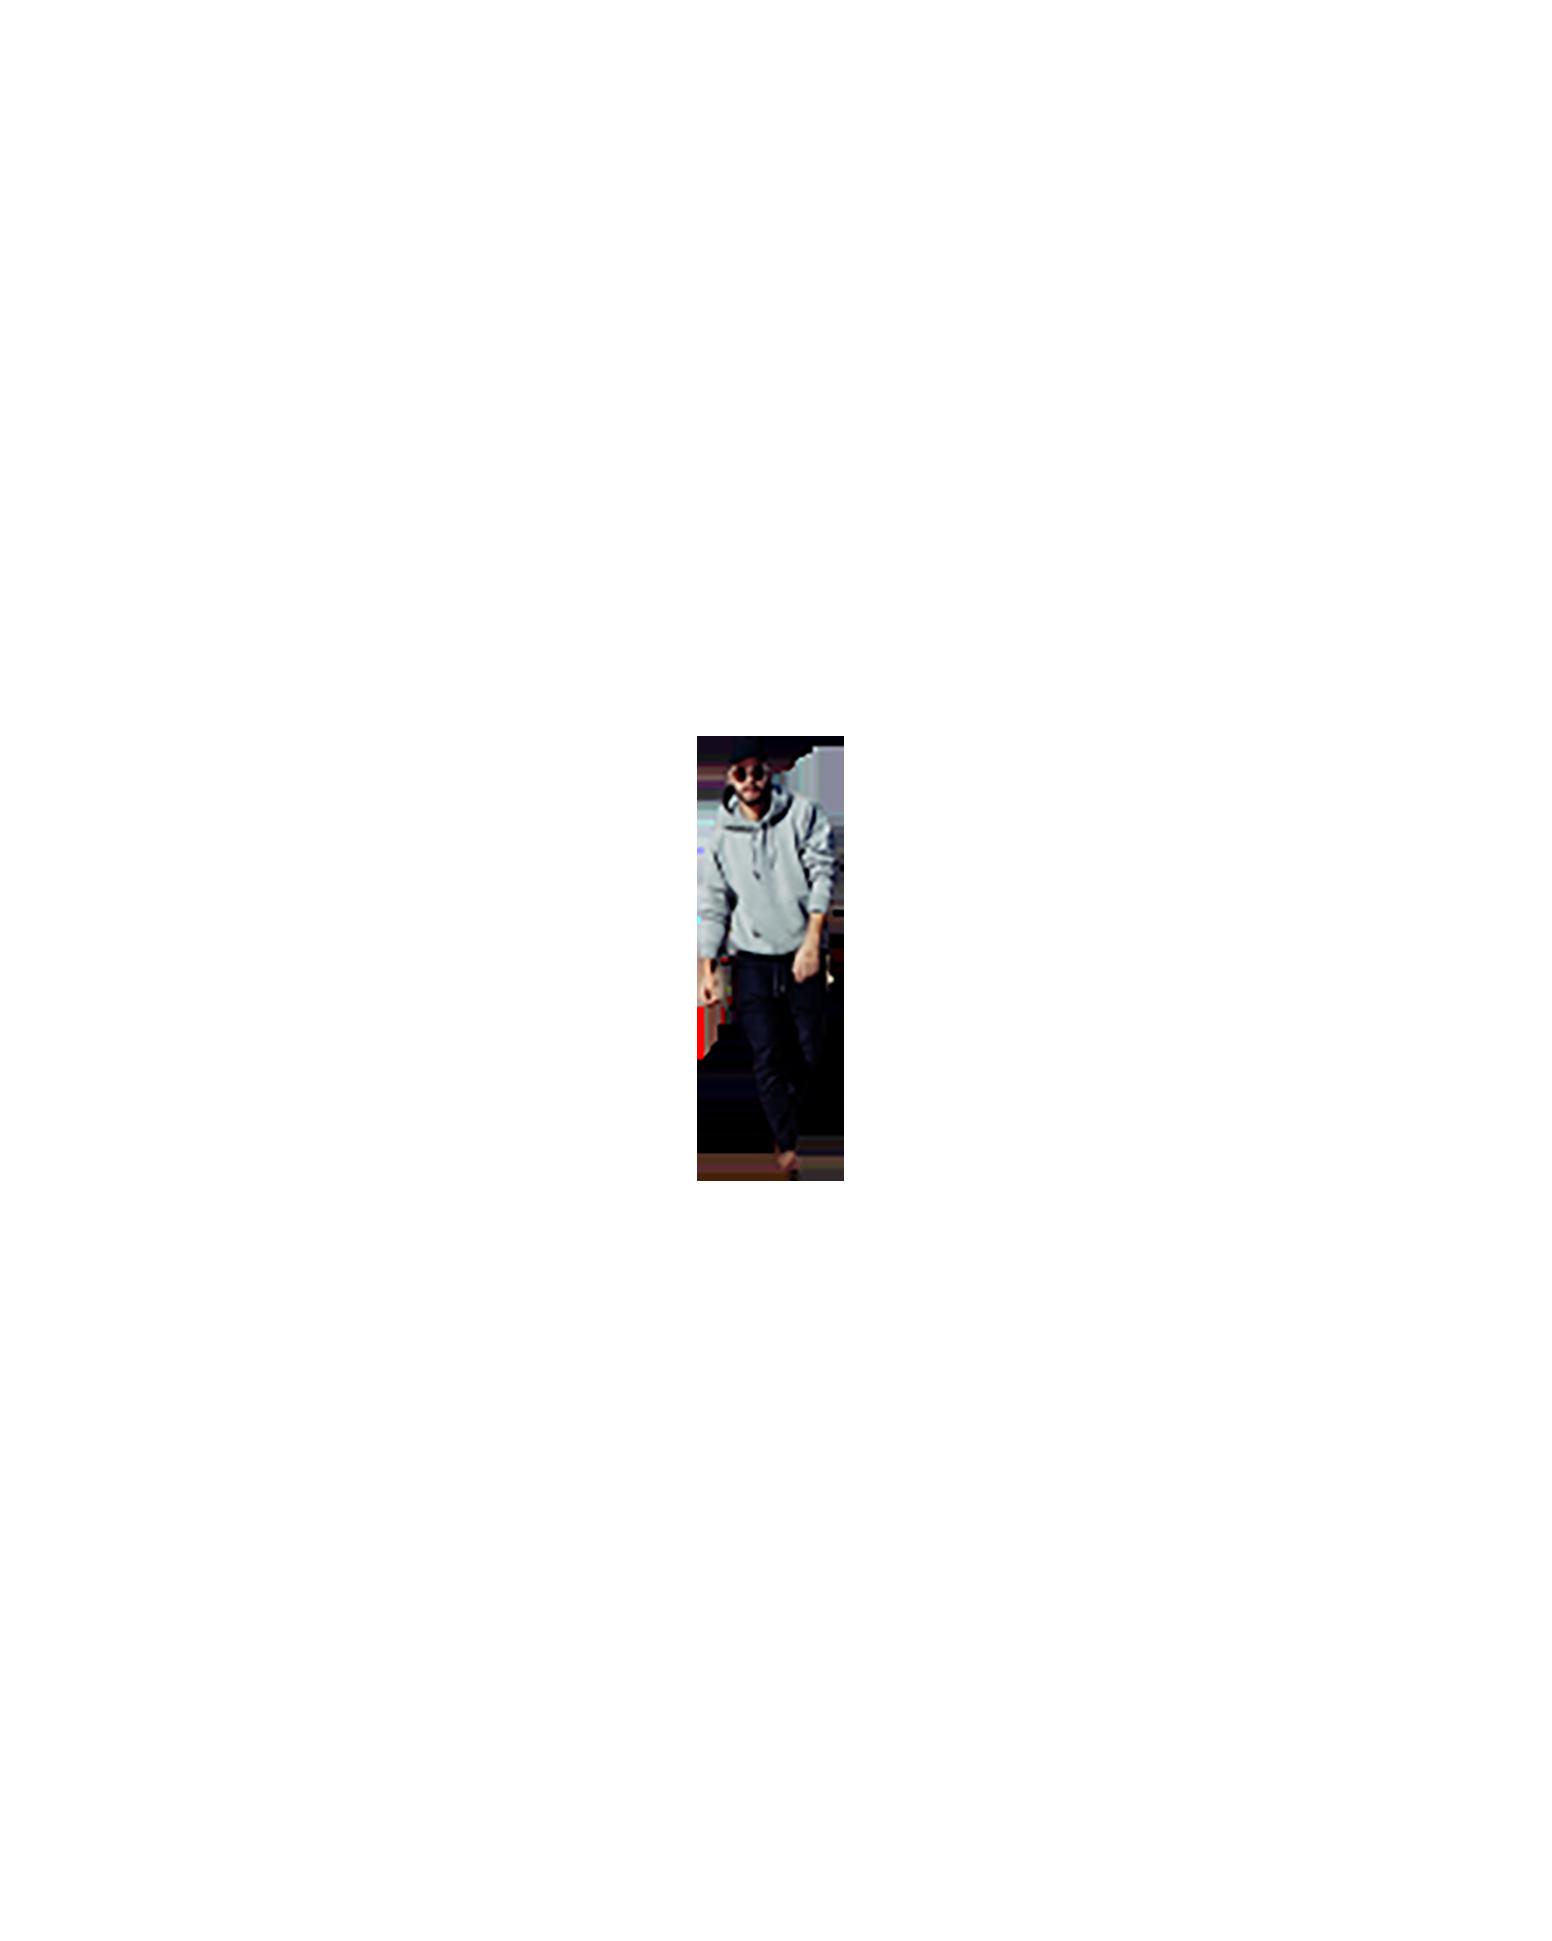 Stylish man walking transparent background PNG